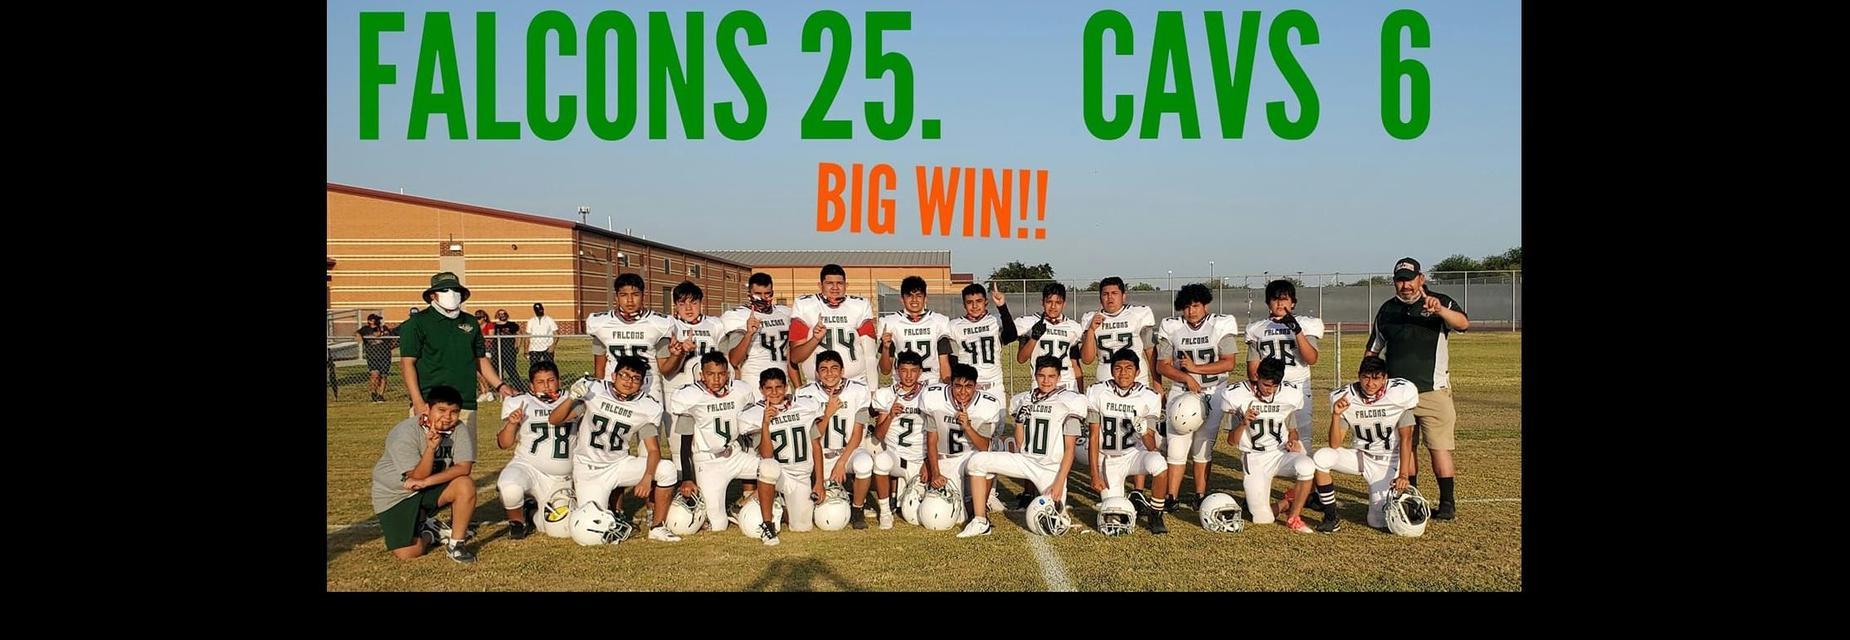 Falcons beat Cavs